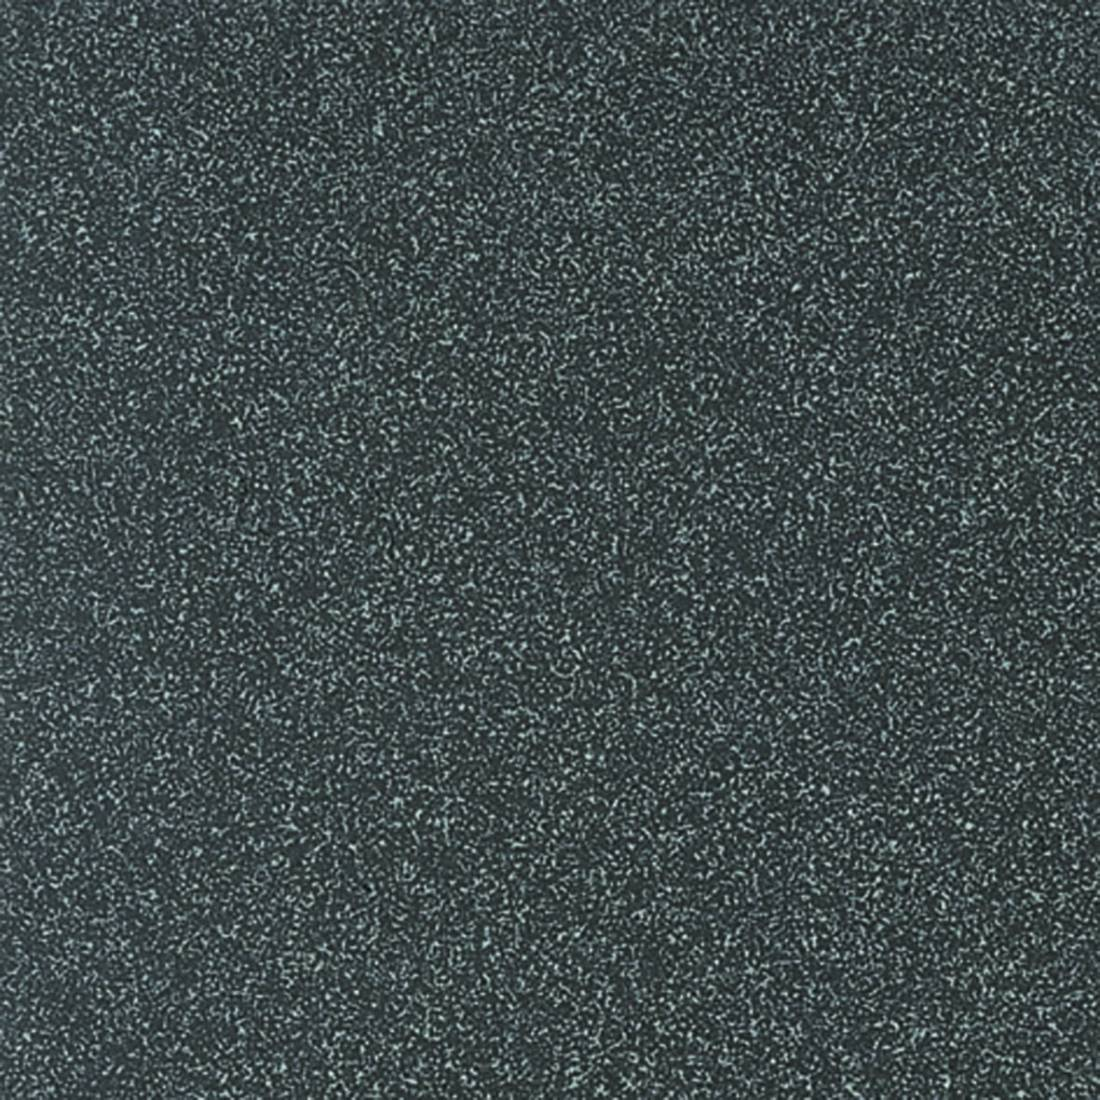 Granit 30x30 Rio Negro Black Matt R9 1